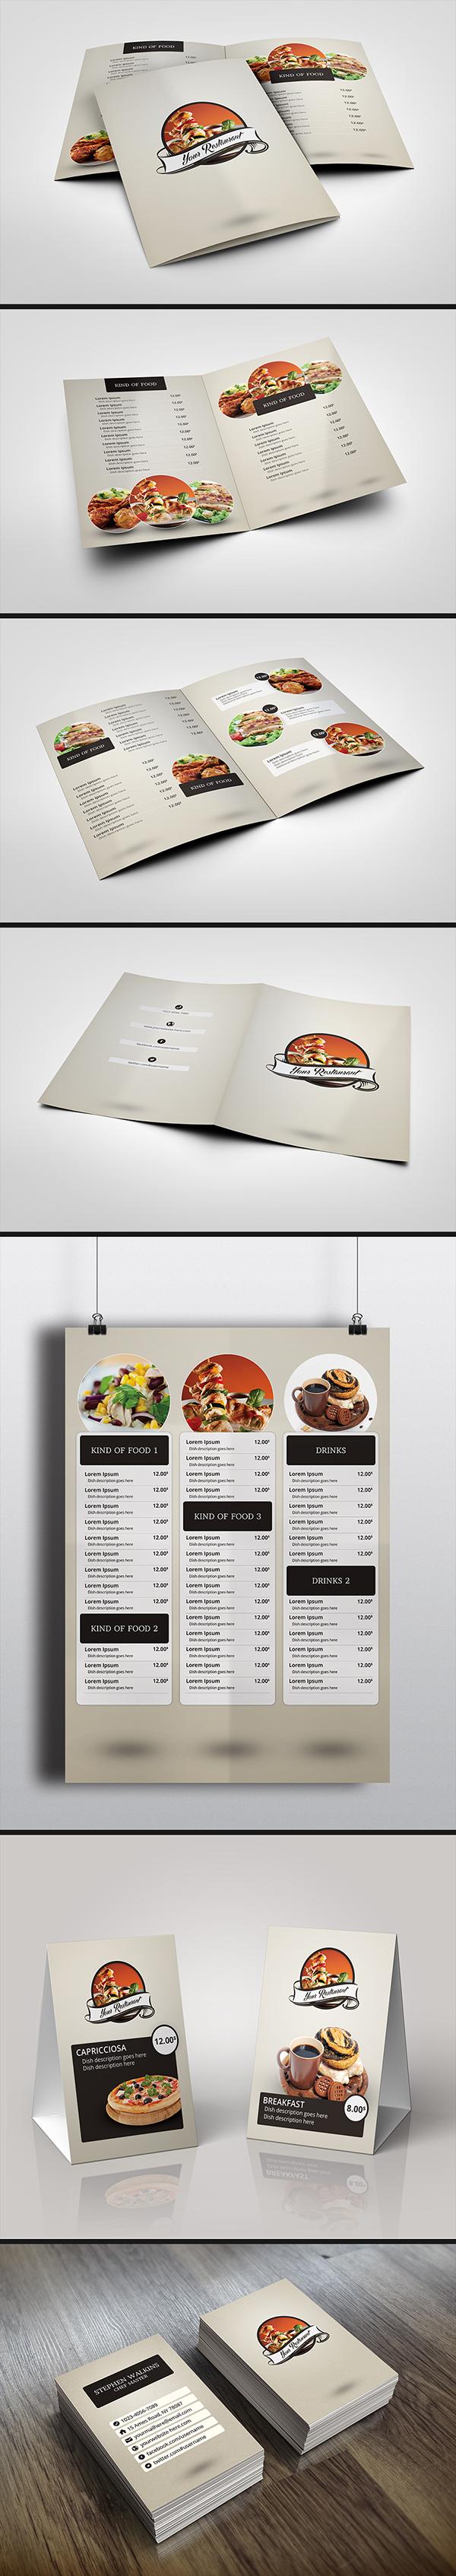 Clean Elegant Restaurant Menu Design On Behance